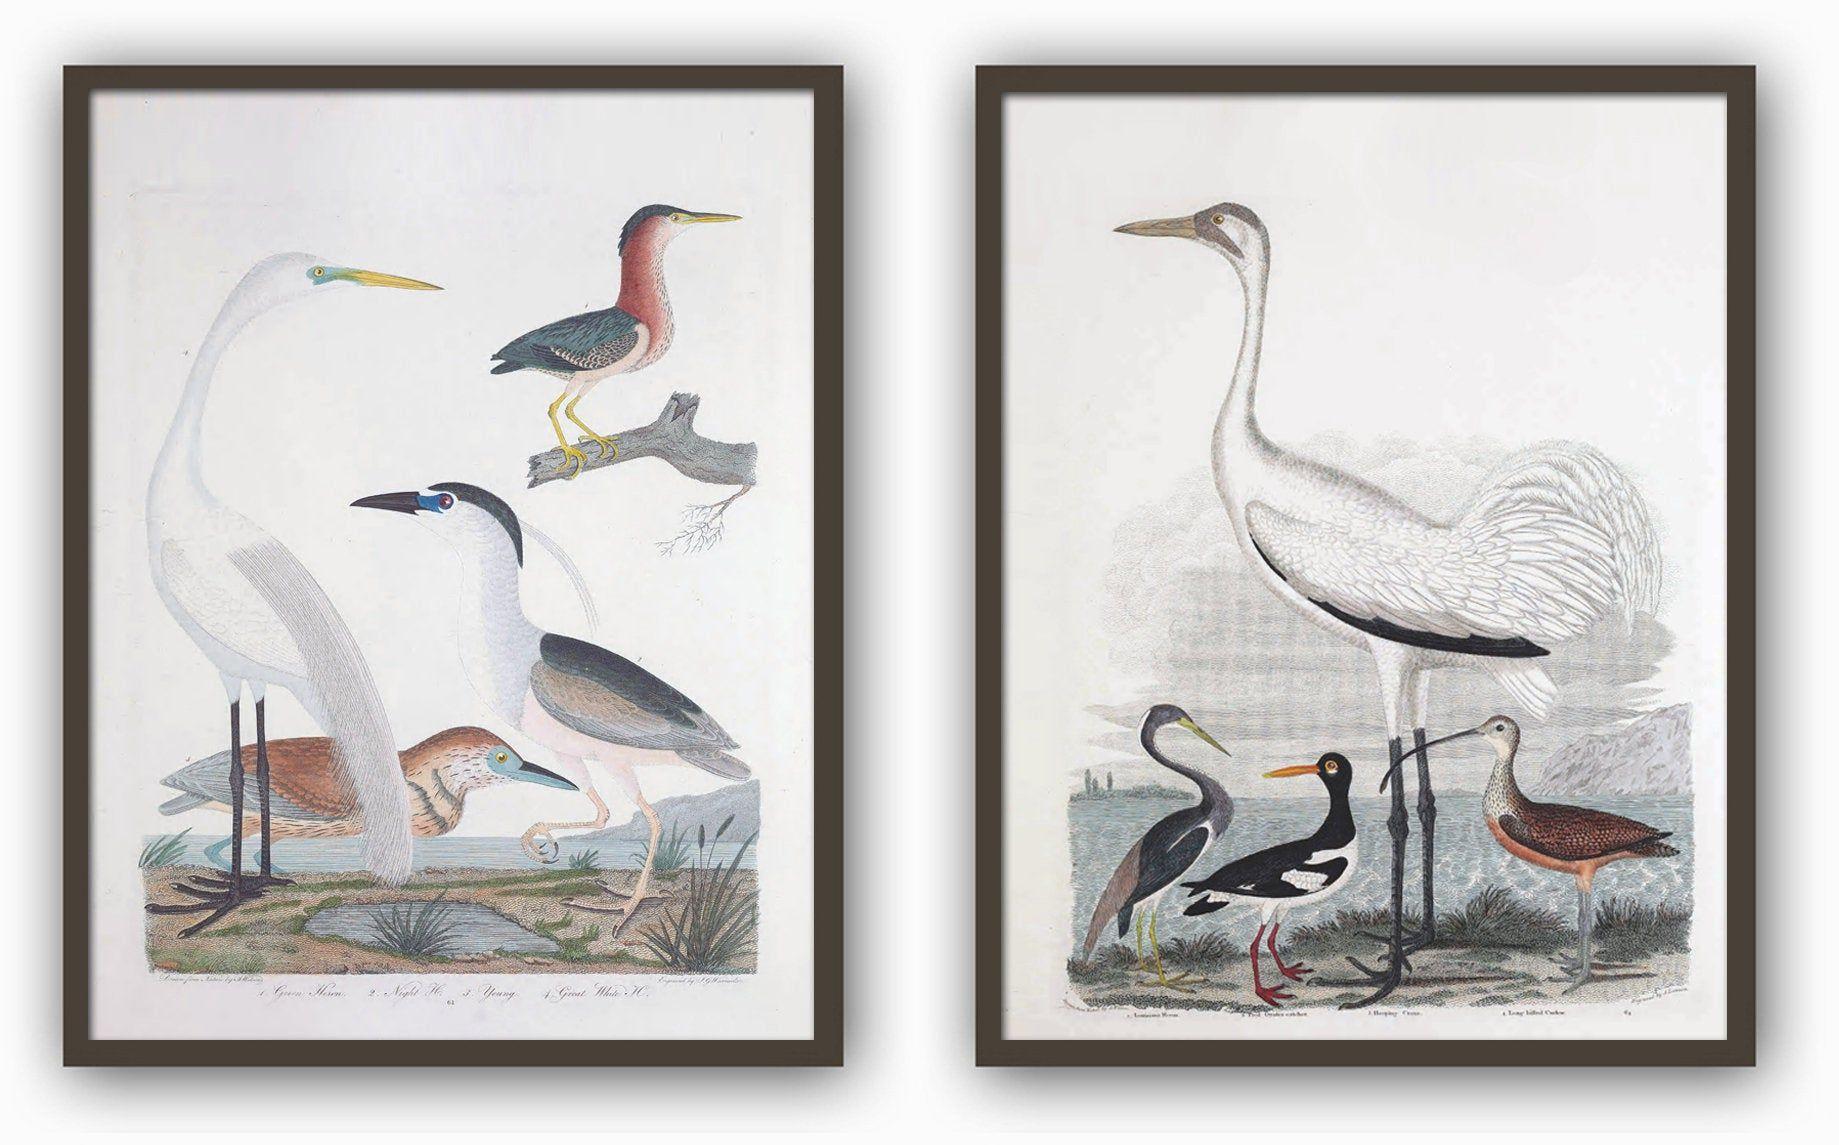 Birds Print Set Of 2 Large Wall Art Decor Heron And Crane Etsy Bird Prints Turtle Wall Art Antique Bird Illustration